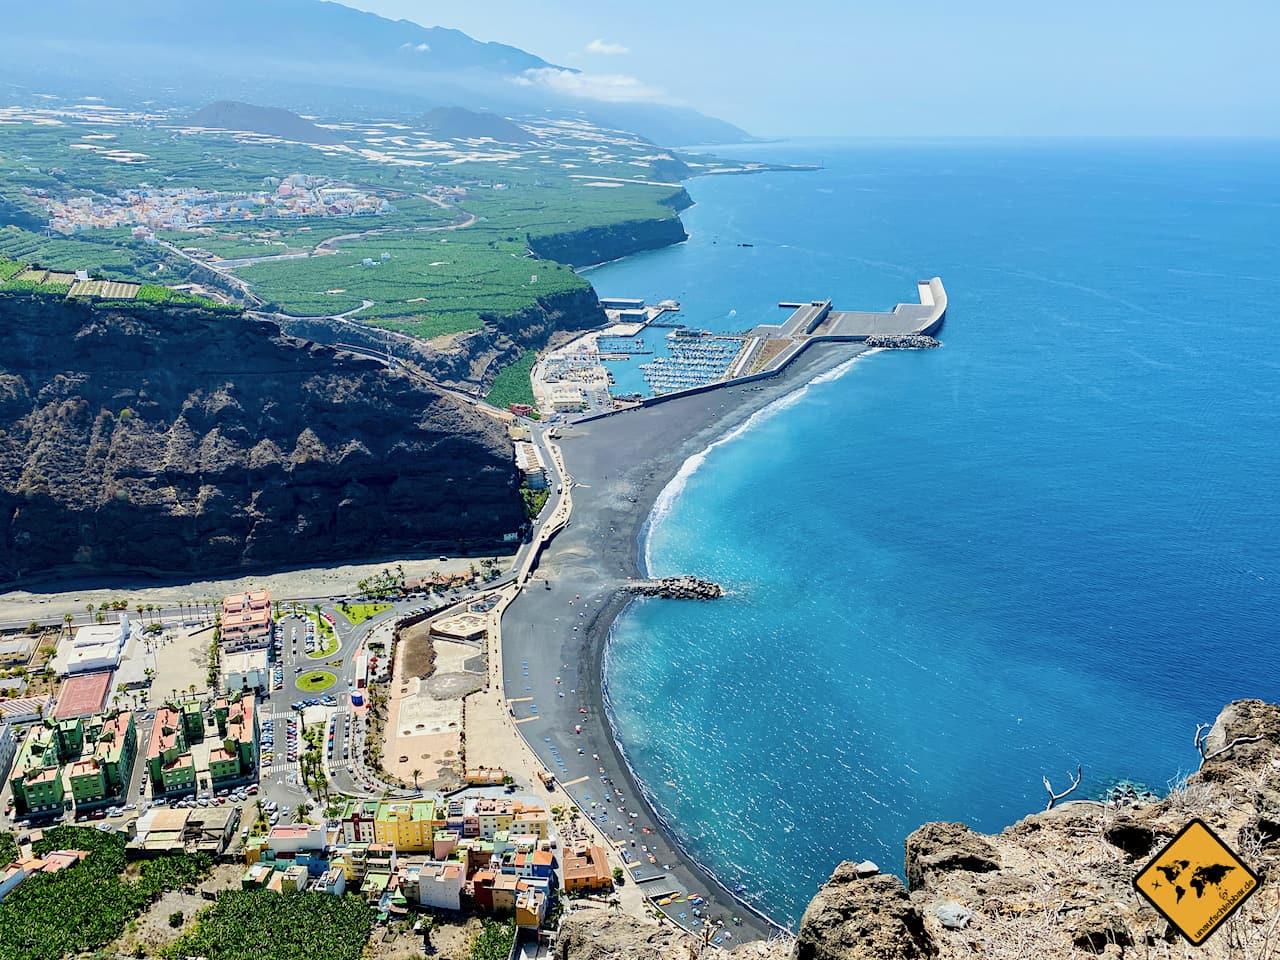 Mirador de La Punta La Palma